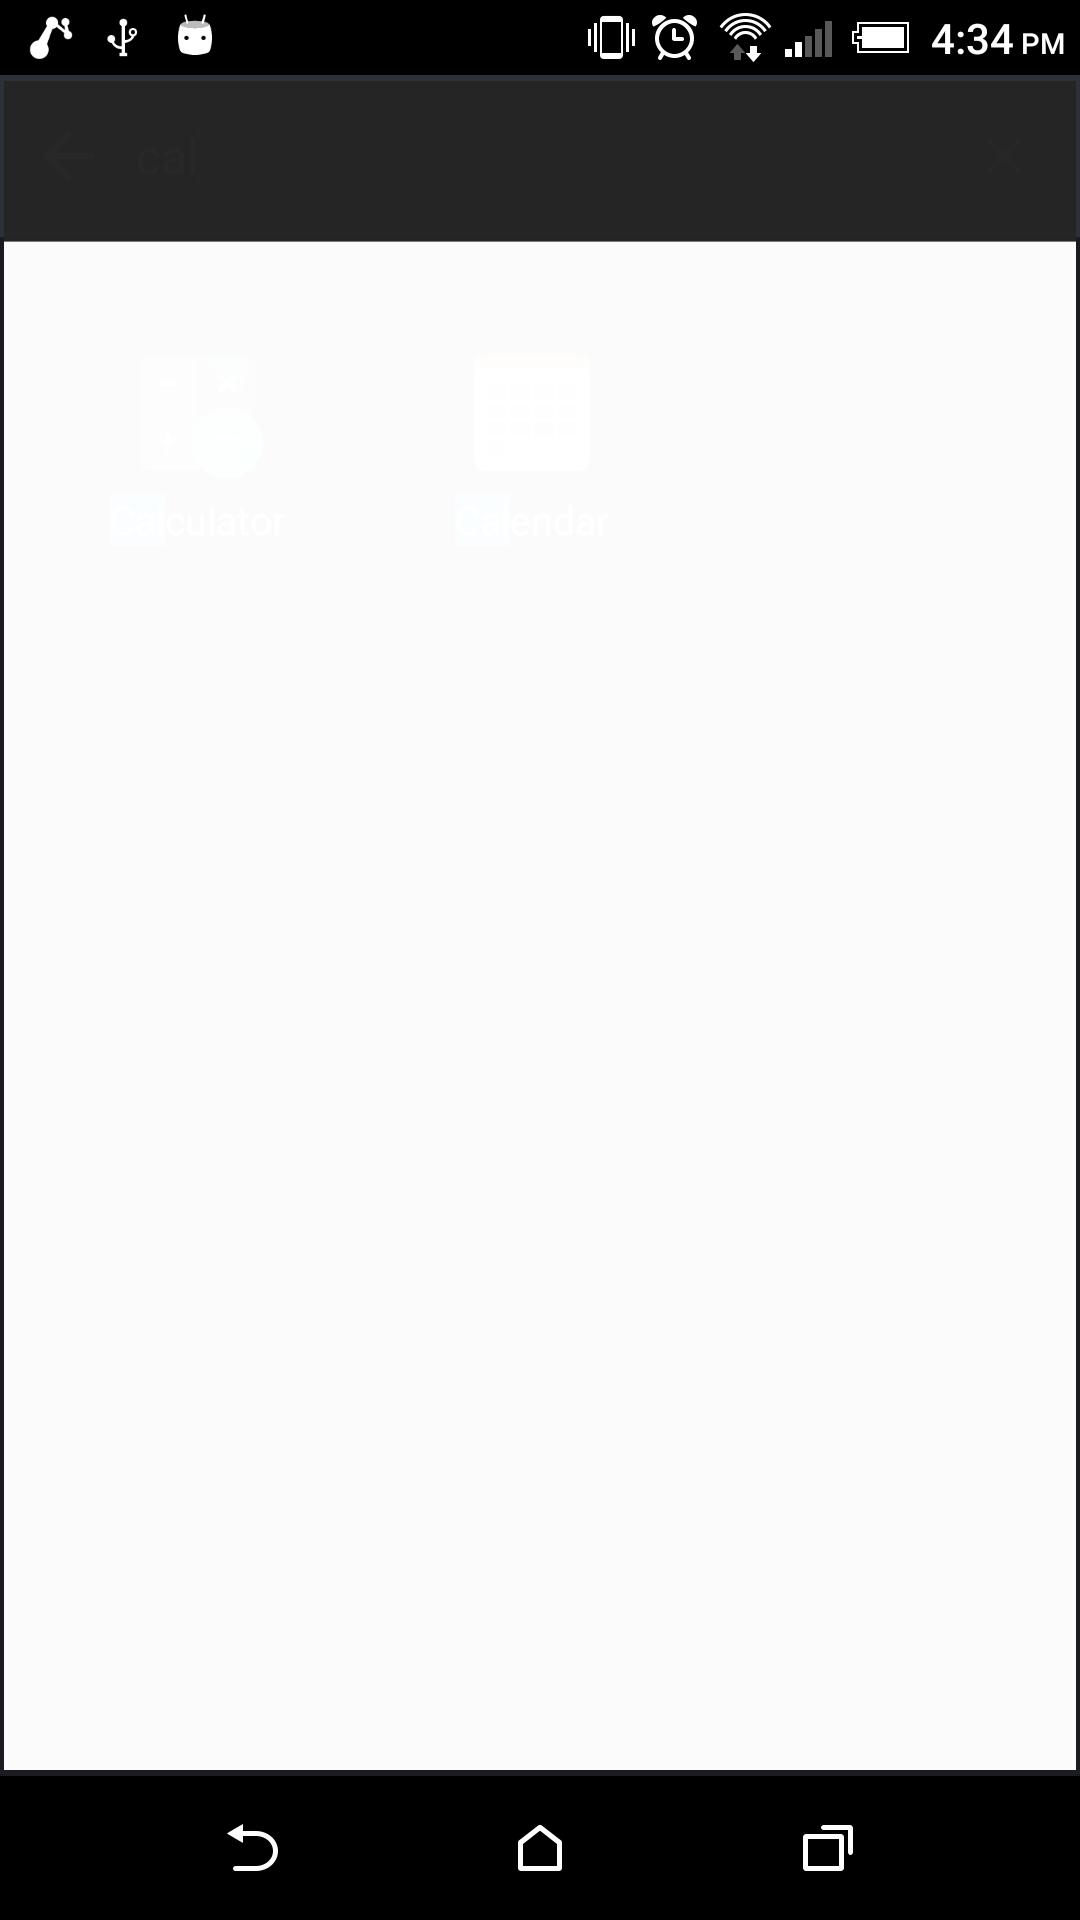 white_screen